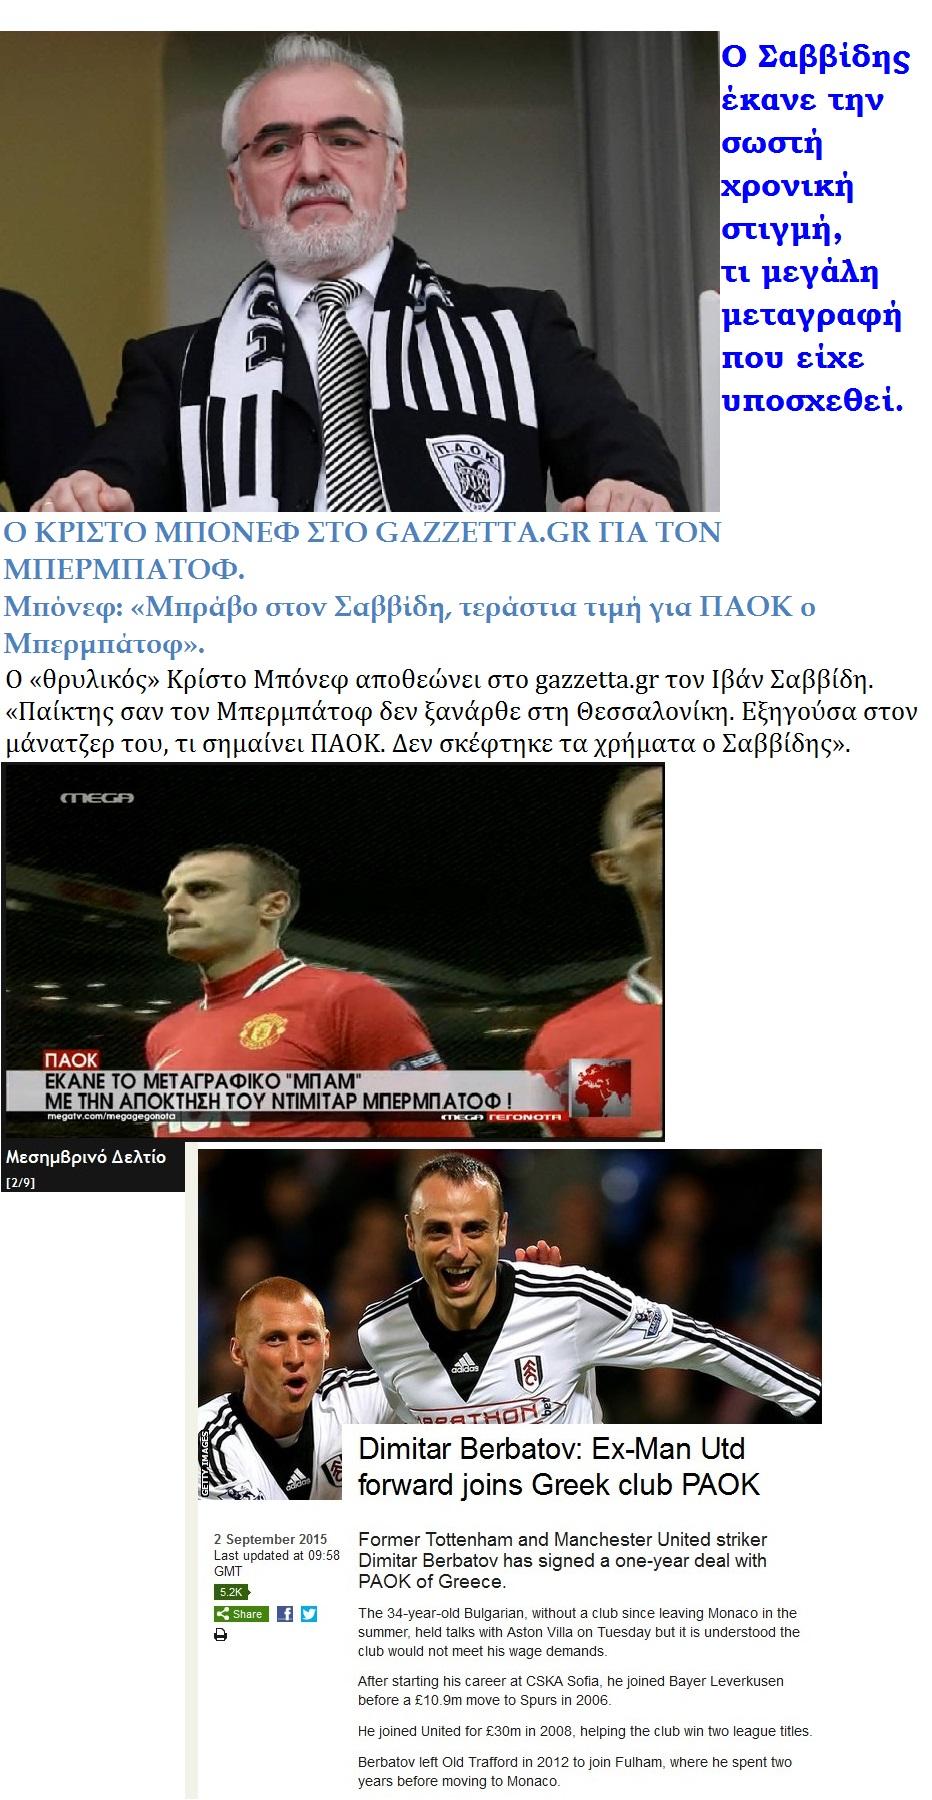 FOOTBALL PAOK SABIDHS DIMITAR BERBATOV 01 030915